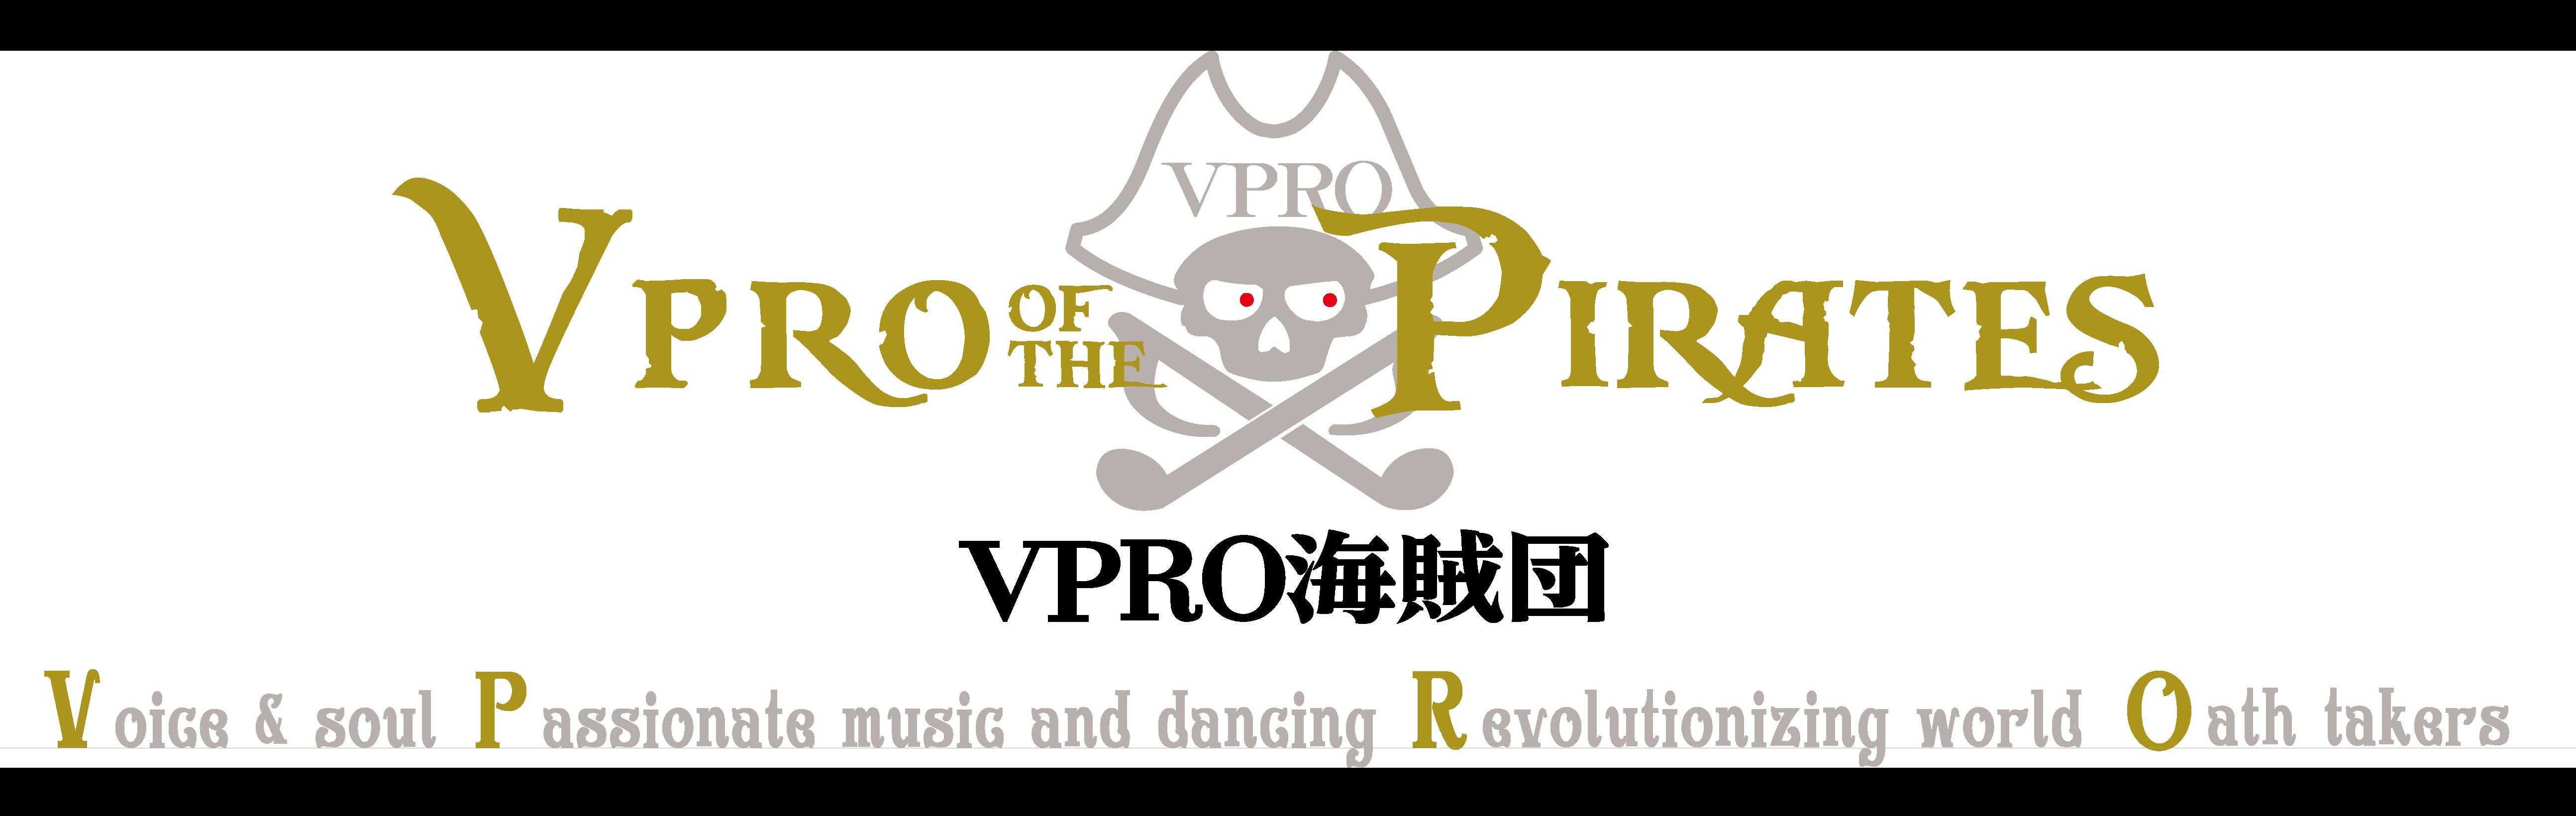 VPRO(ブイプロ)海賊団|歌うコスプレ・エアー・パフォーマンス集団